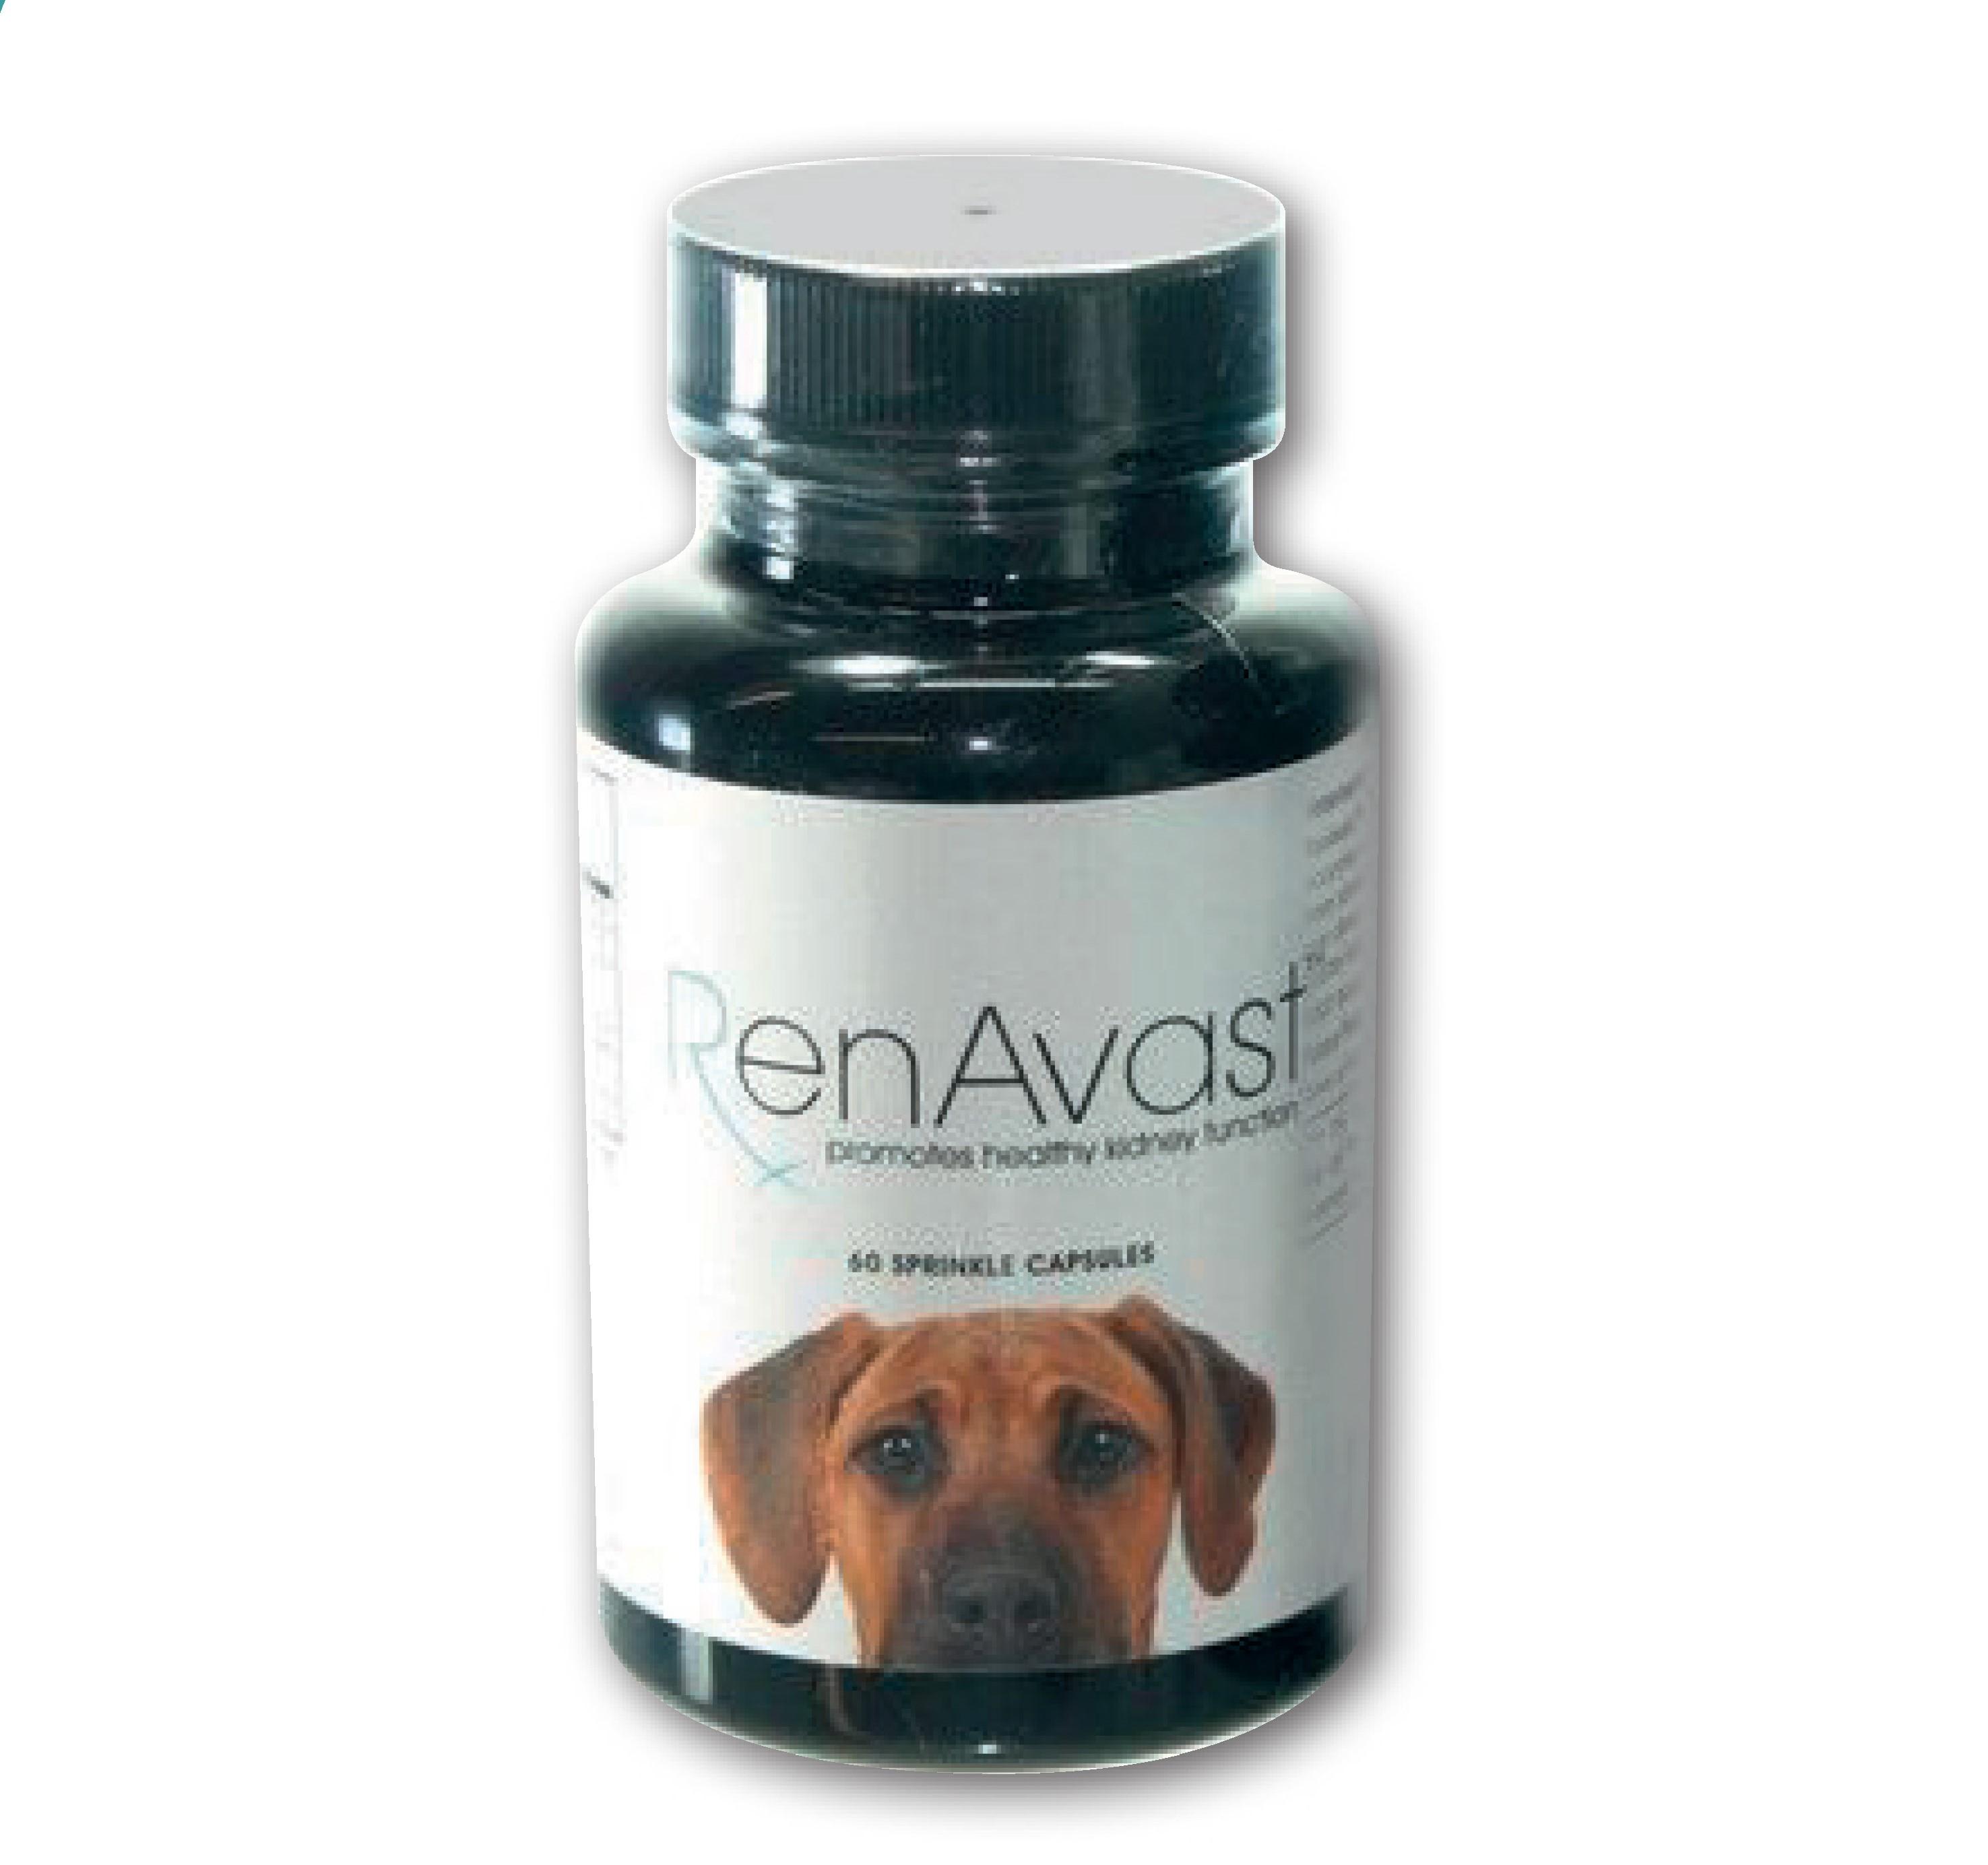 RenAvast 1000 mg